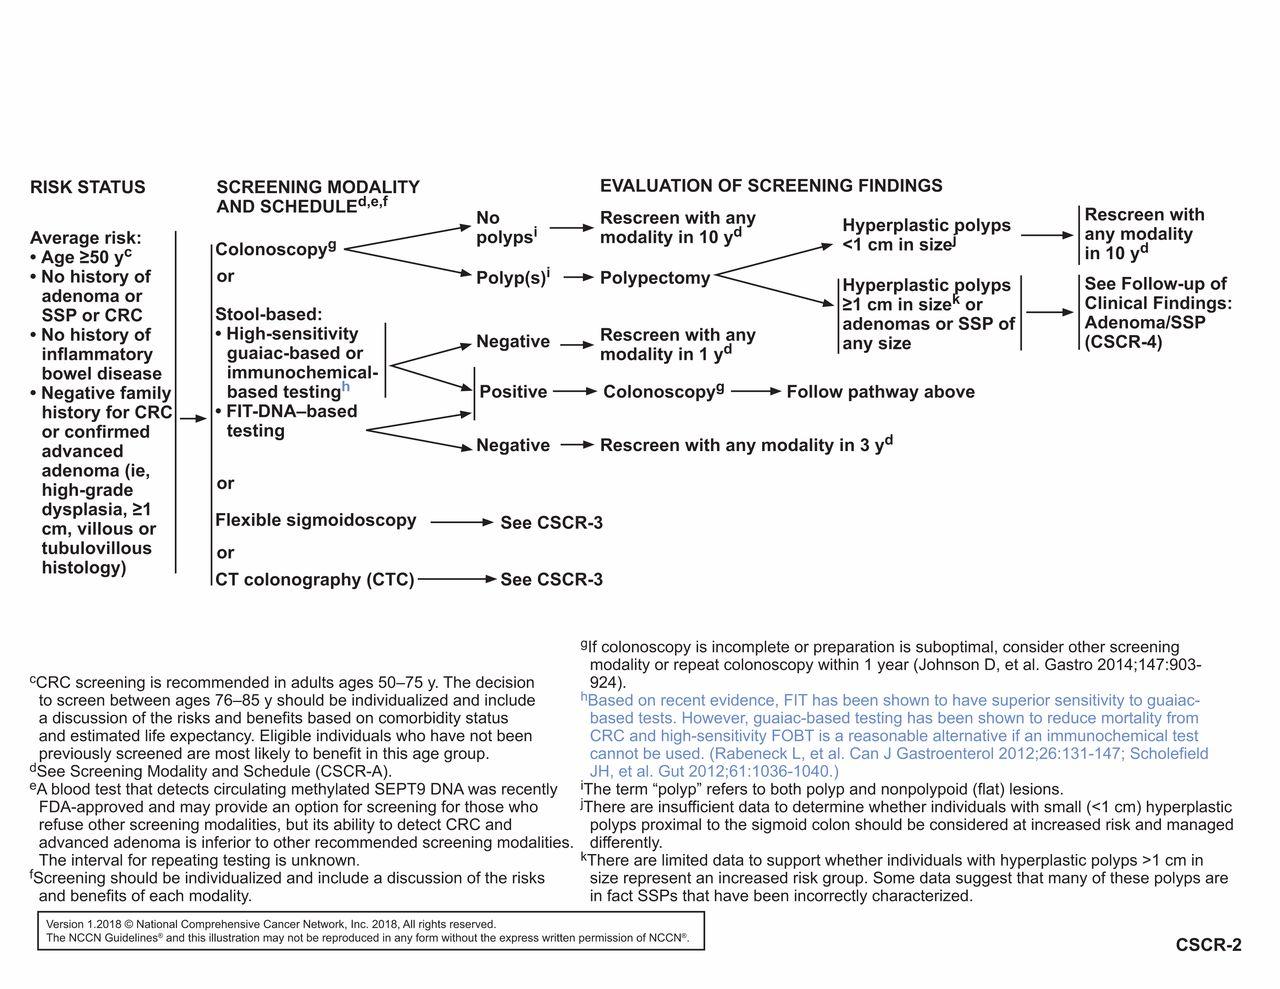 Cancer de colon nccn - anvelope-janteauto.ro - Cancer colon nccn